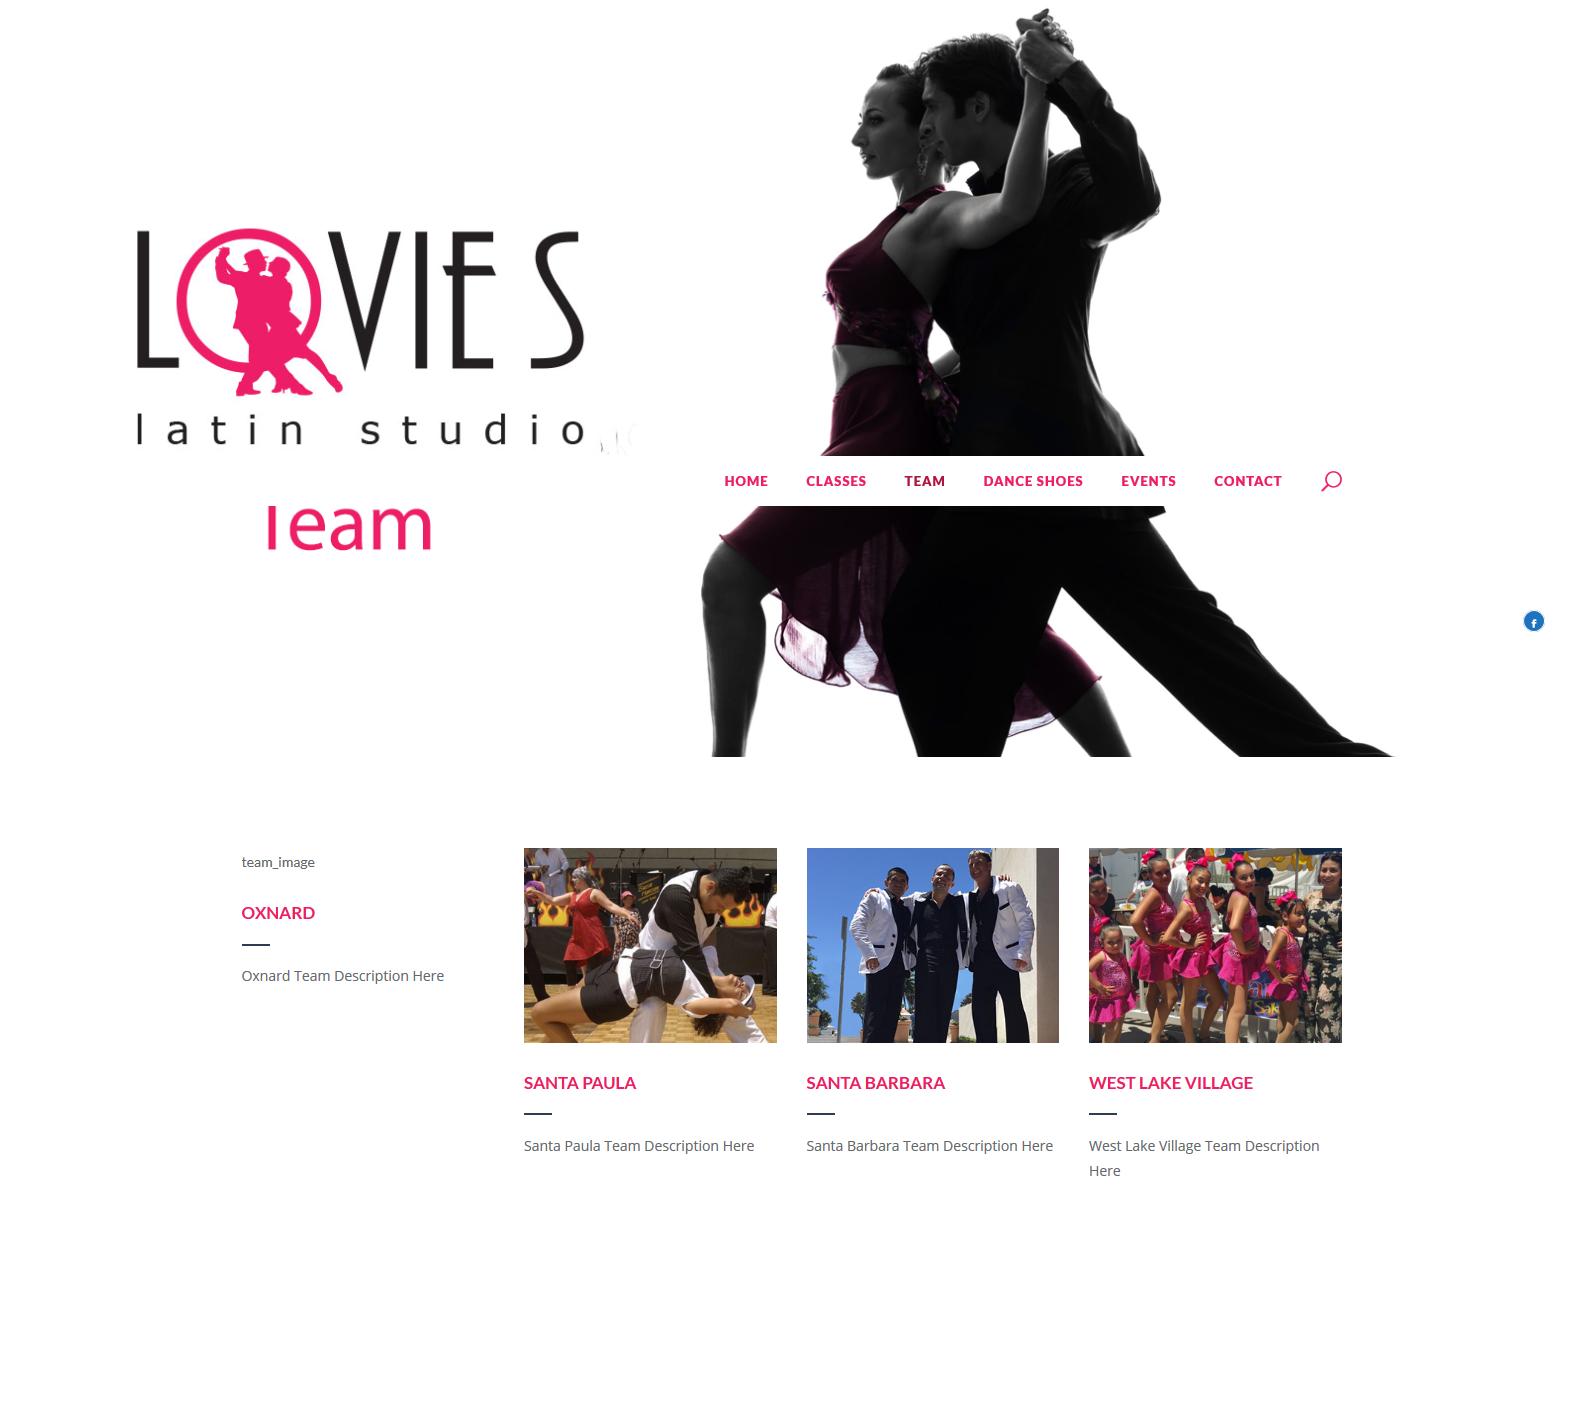 Lovies' Dance Studio